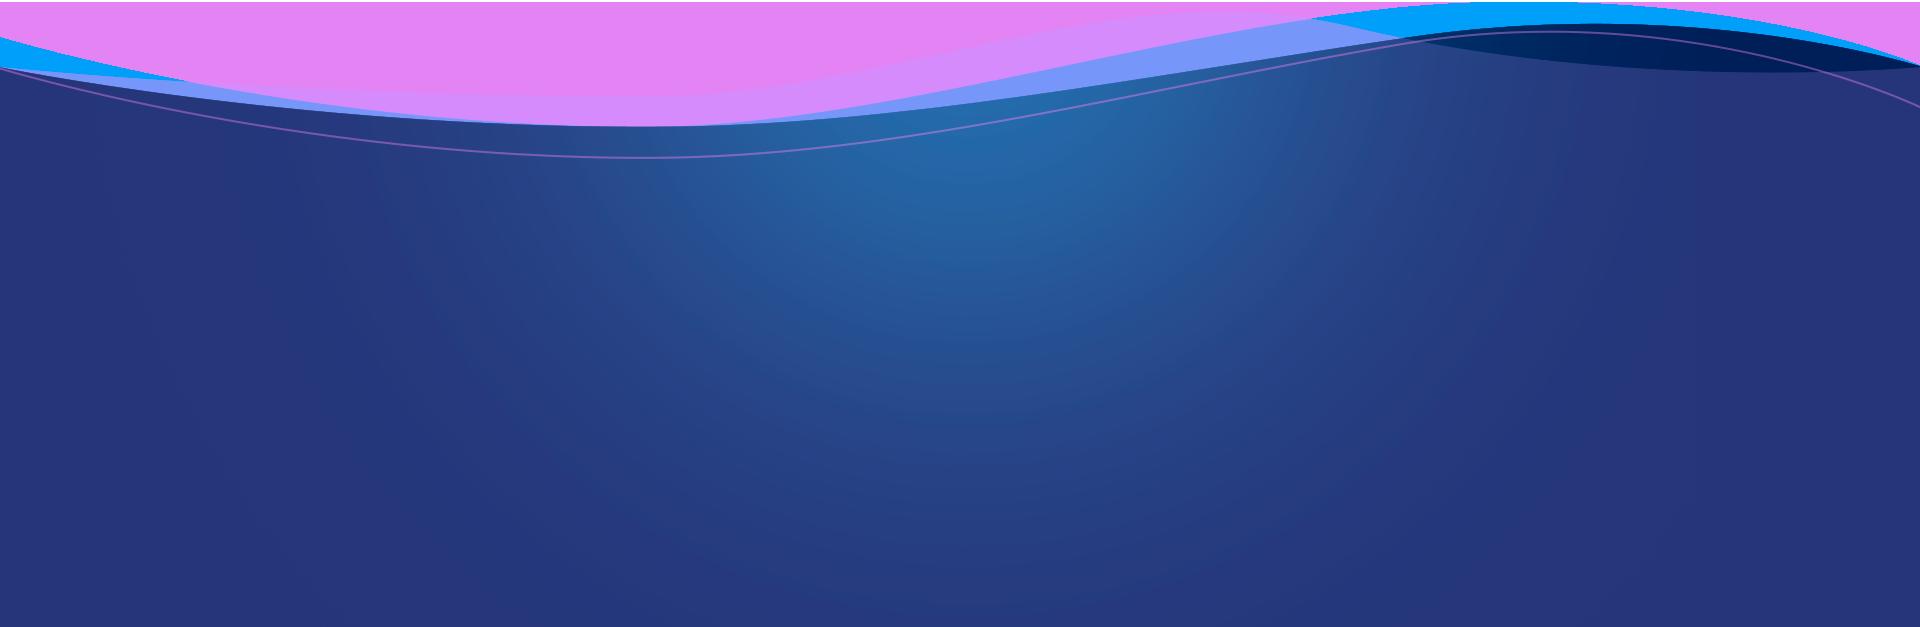 content_wave-bg2